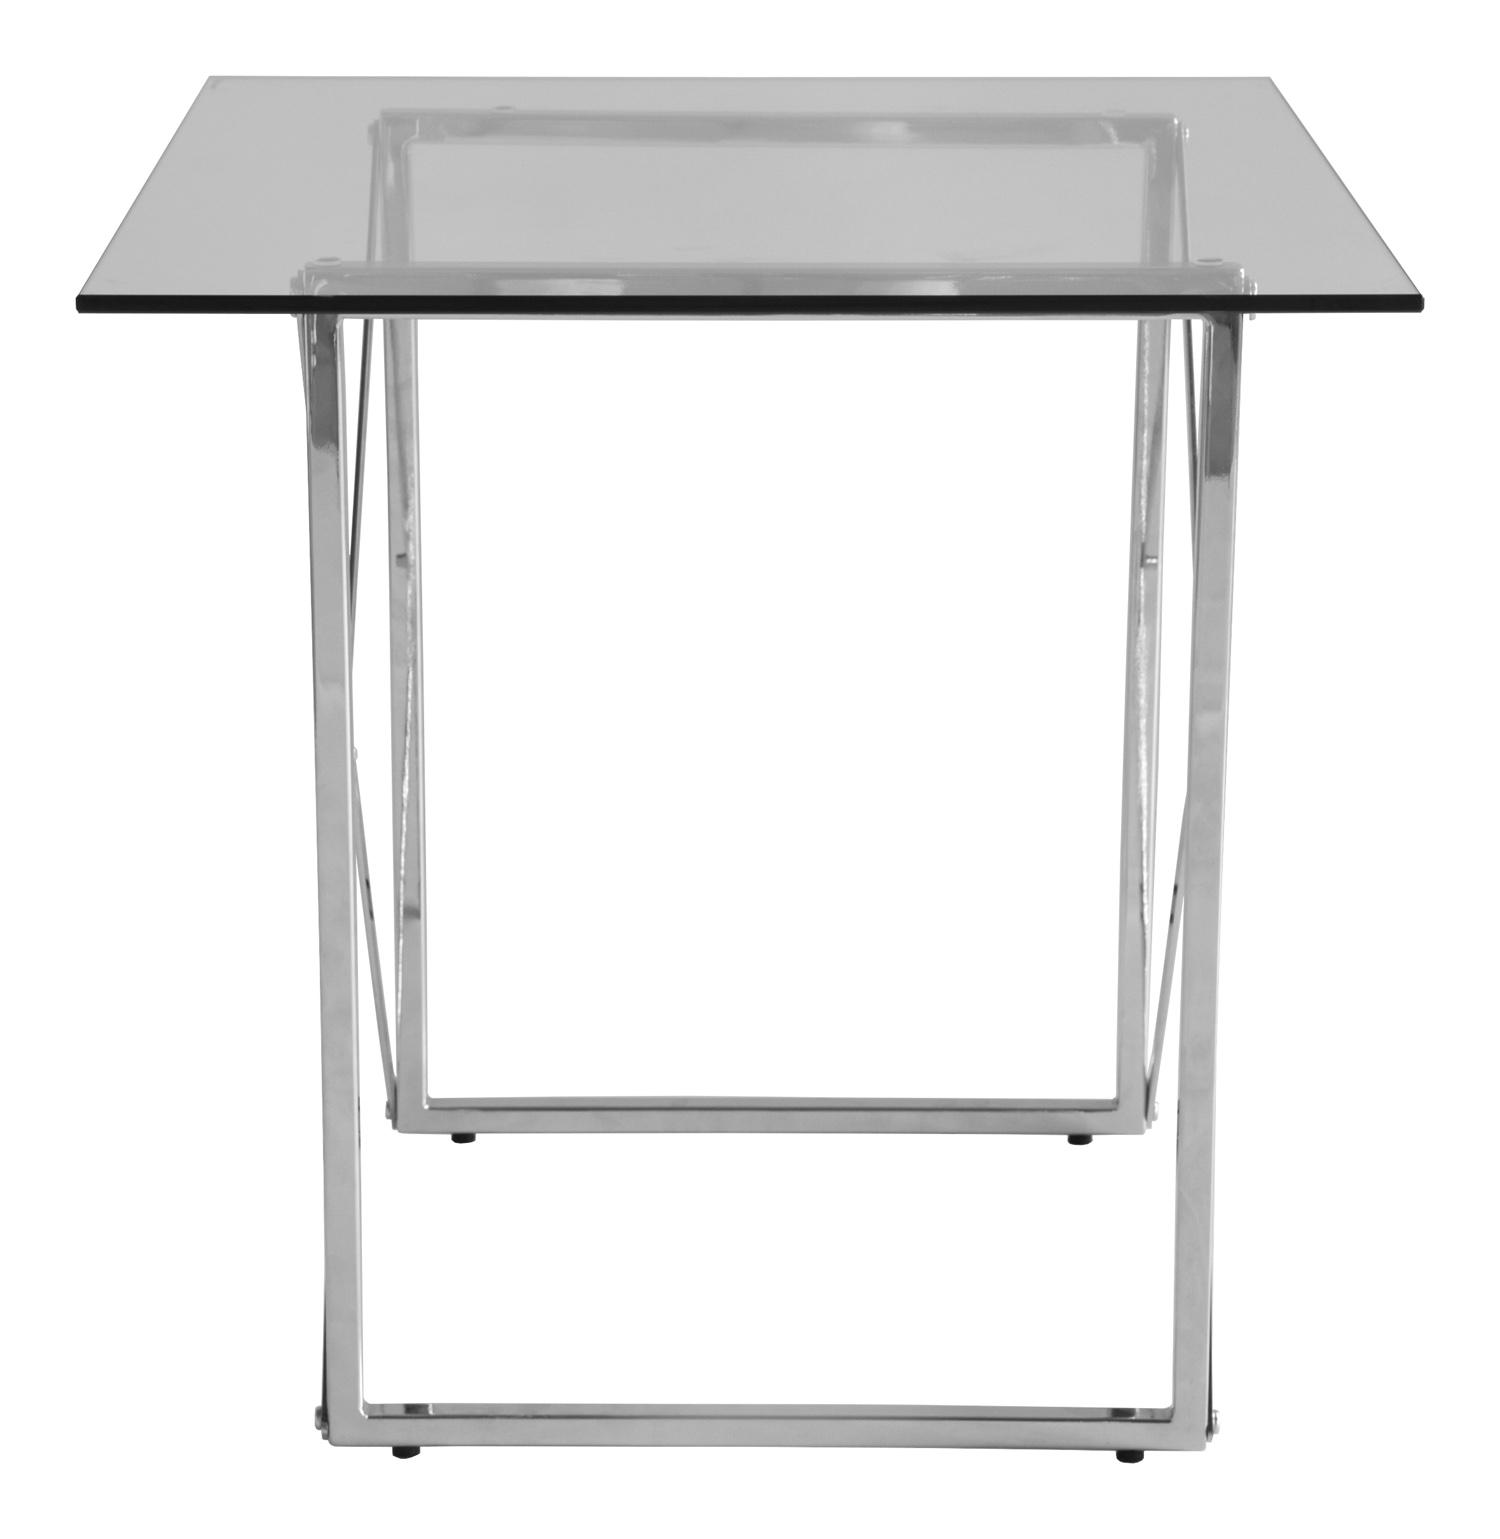 RGE Cross sidebord - glas/sølv glas/metal, kvadratisk (55x55) thumbnail